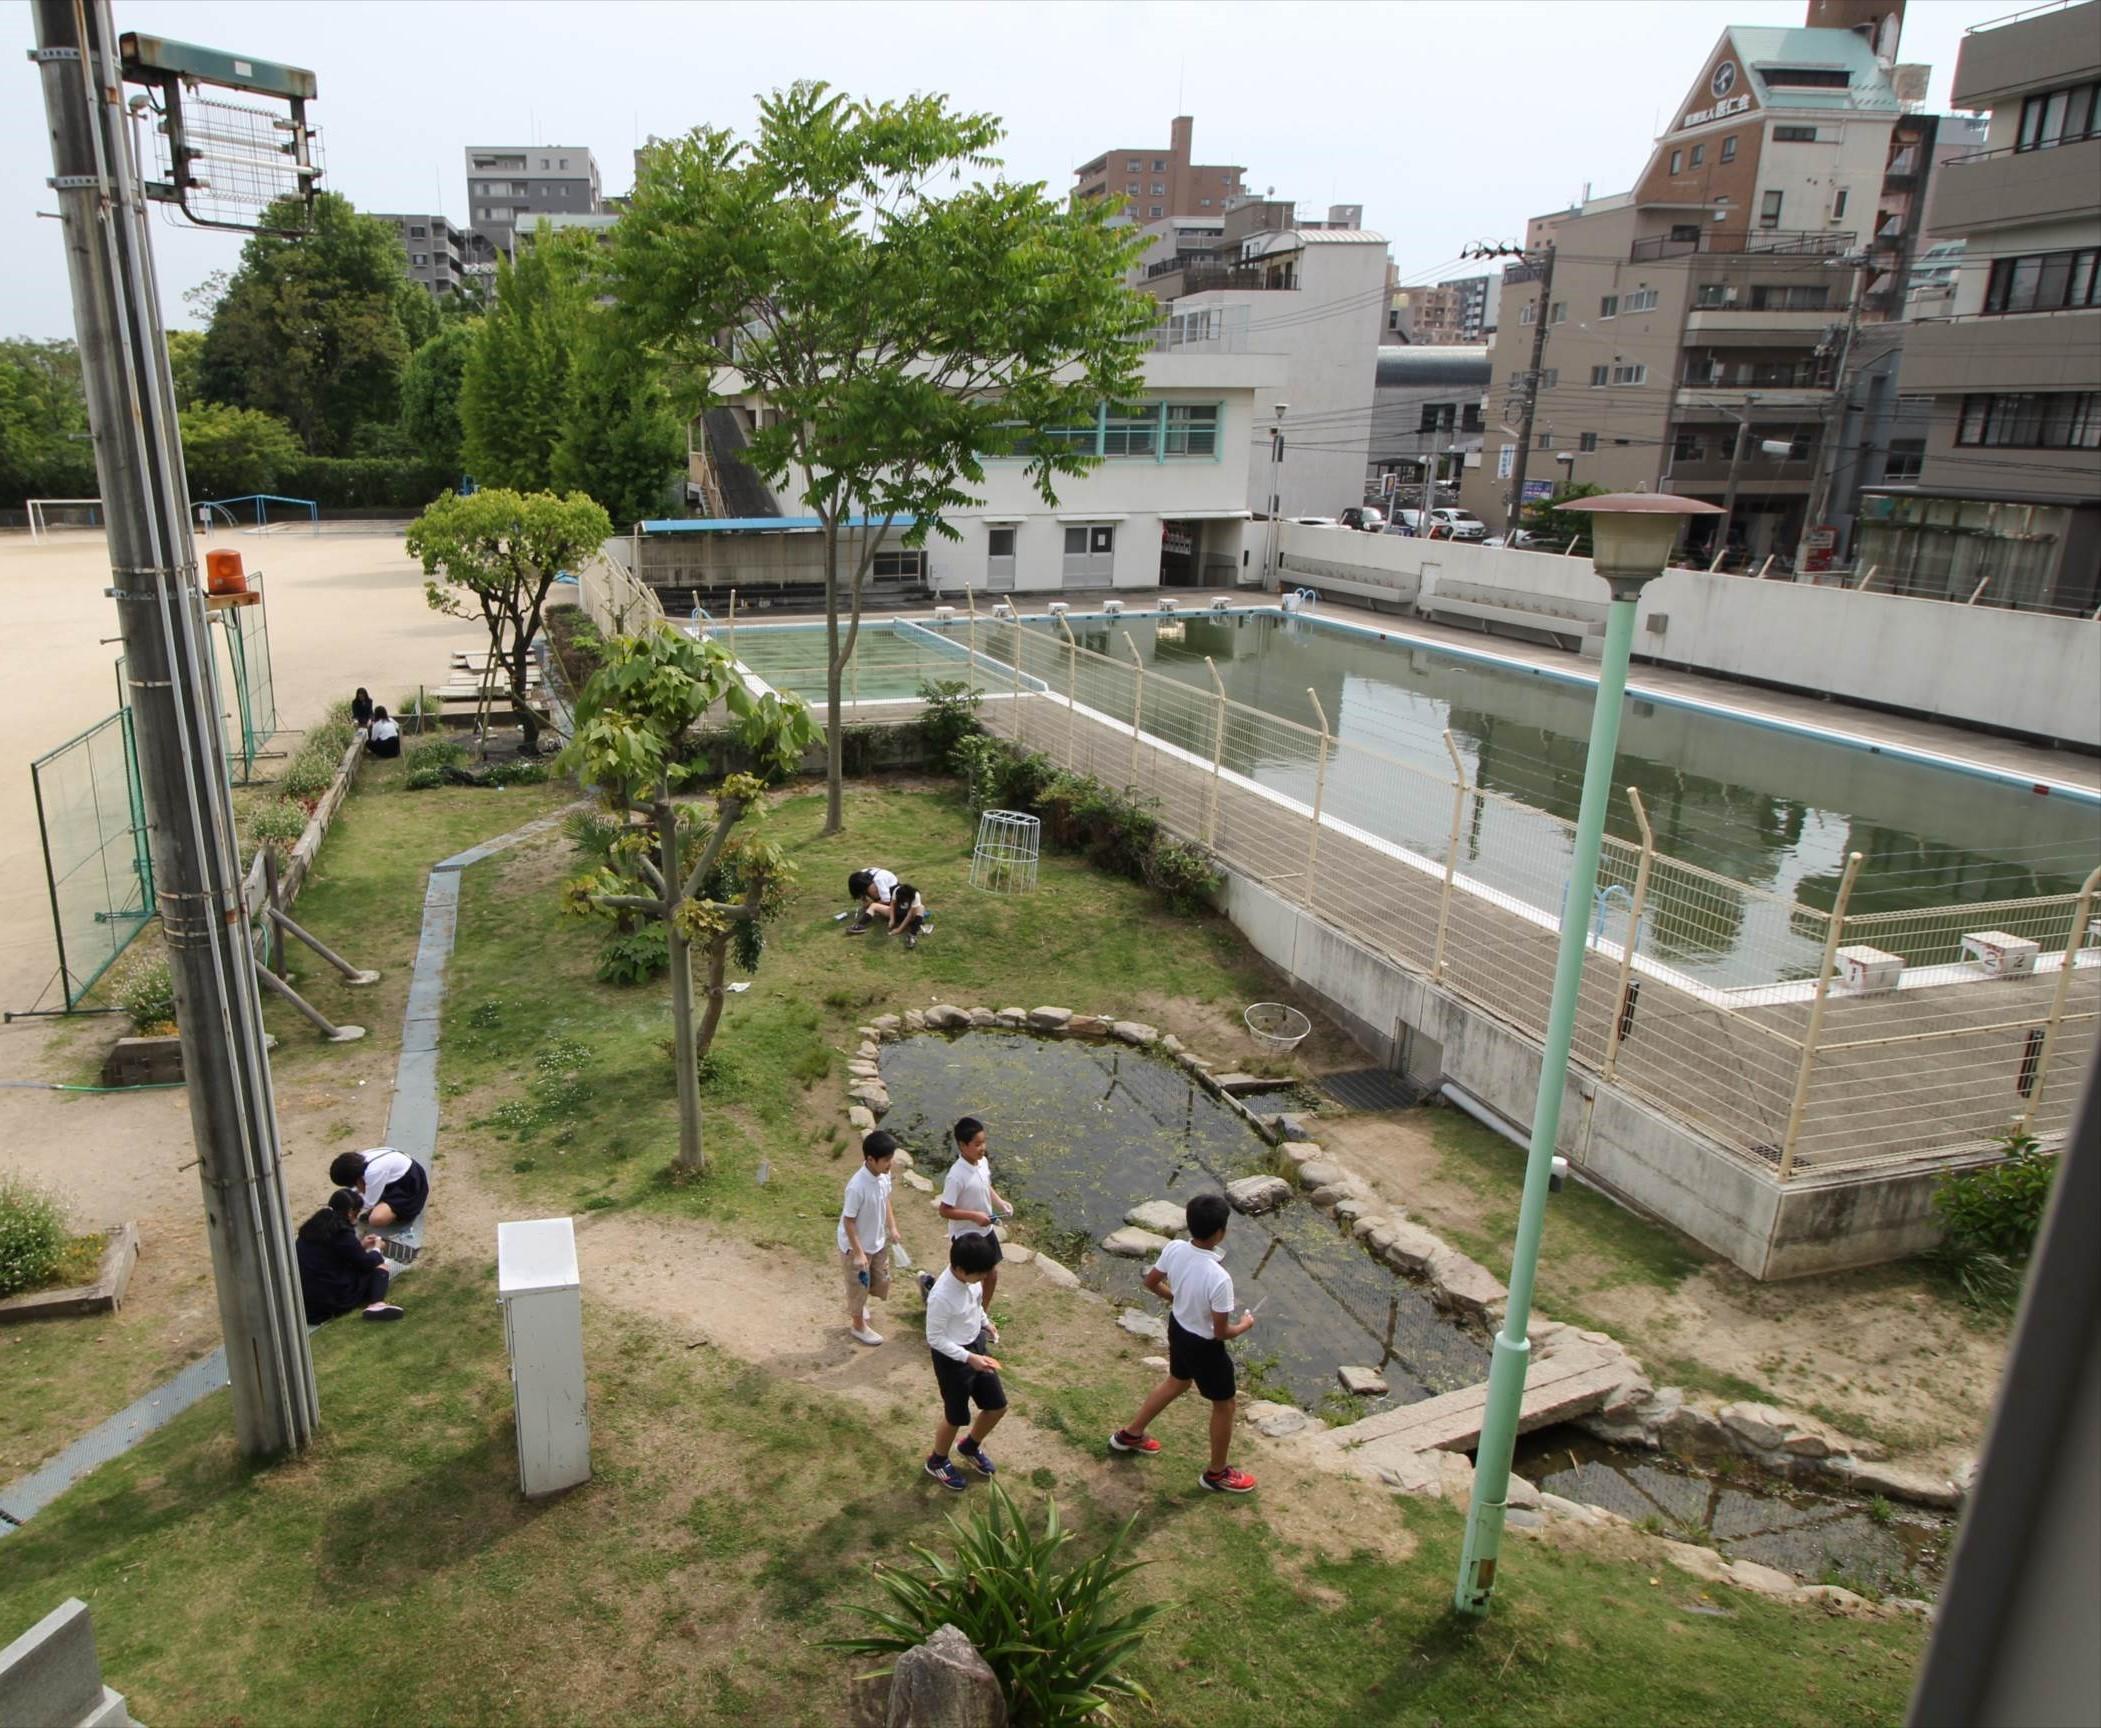 http://rieko-sugihara.com/photo_essay/item/IMG_5782%20%282%29_R.JPG